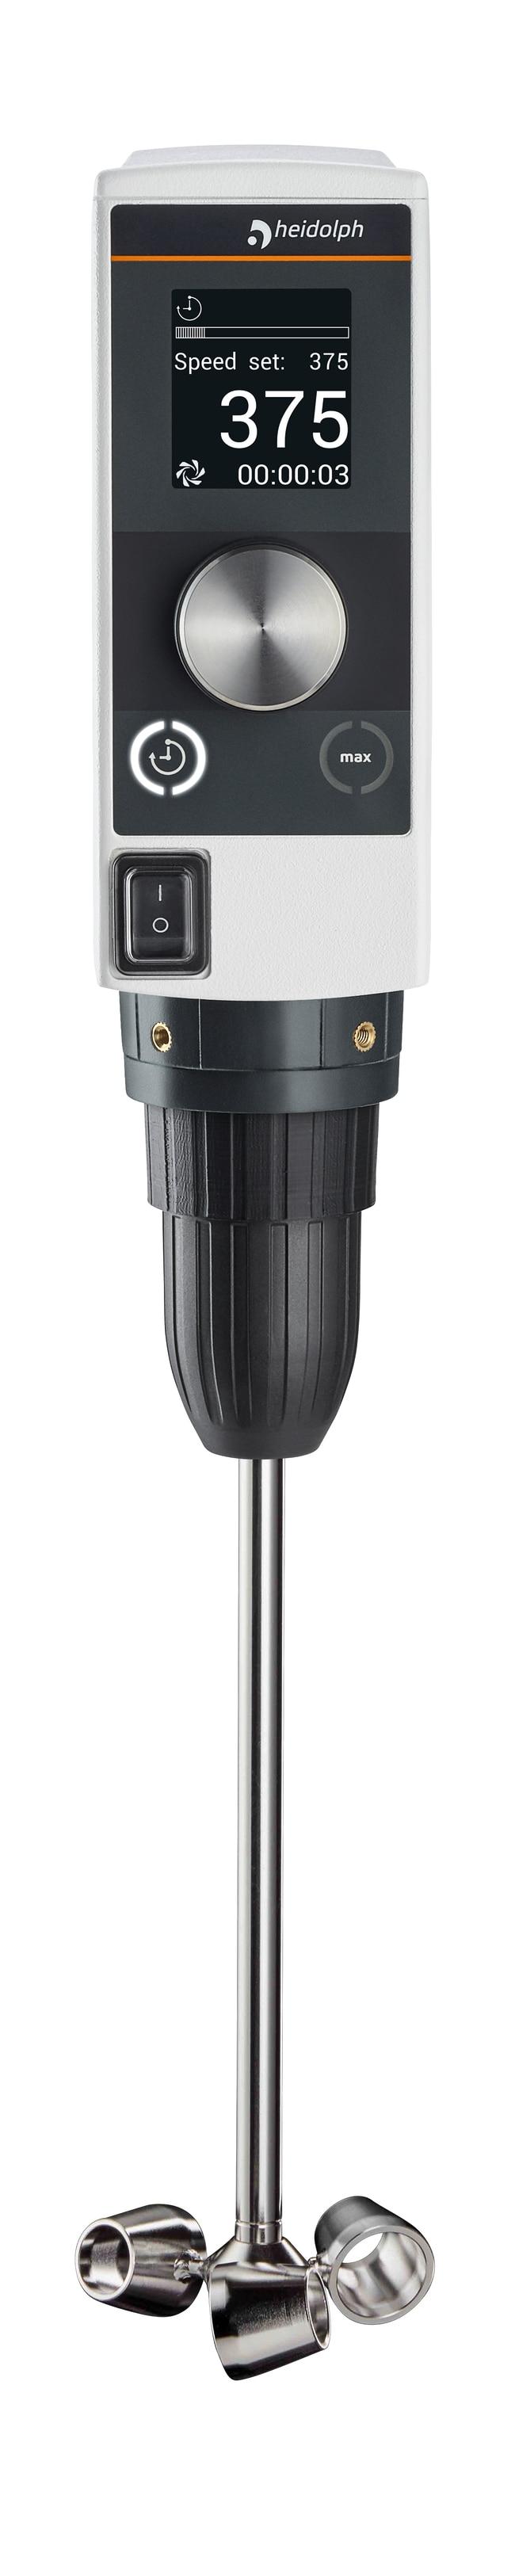 Heidolph™Hei-TORQUE Core Laboratory Overhead Stirrer